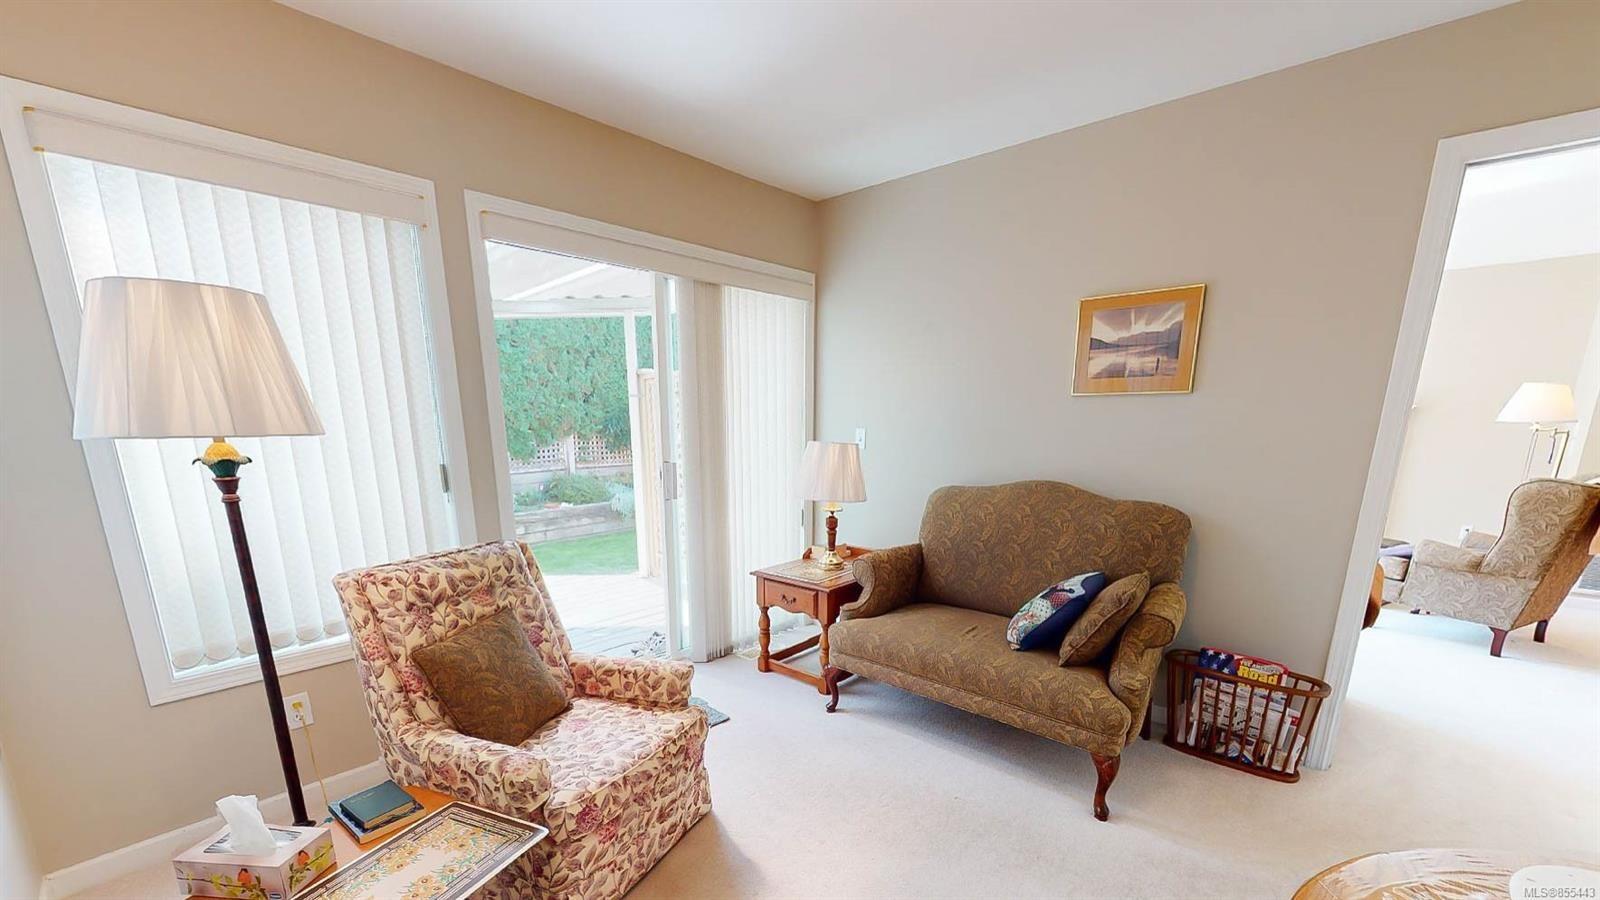 Photo 3: Photos: 1294 Leeward Way in : PQ Qualicum Beach House for sale (Parksville/Qualicum)  : MLS®# 855443